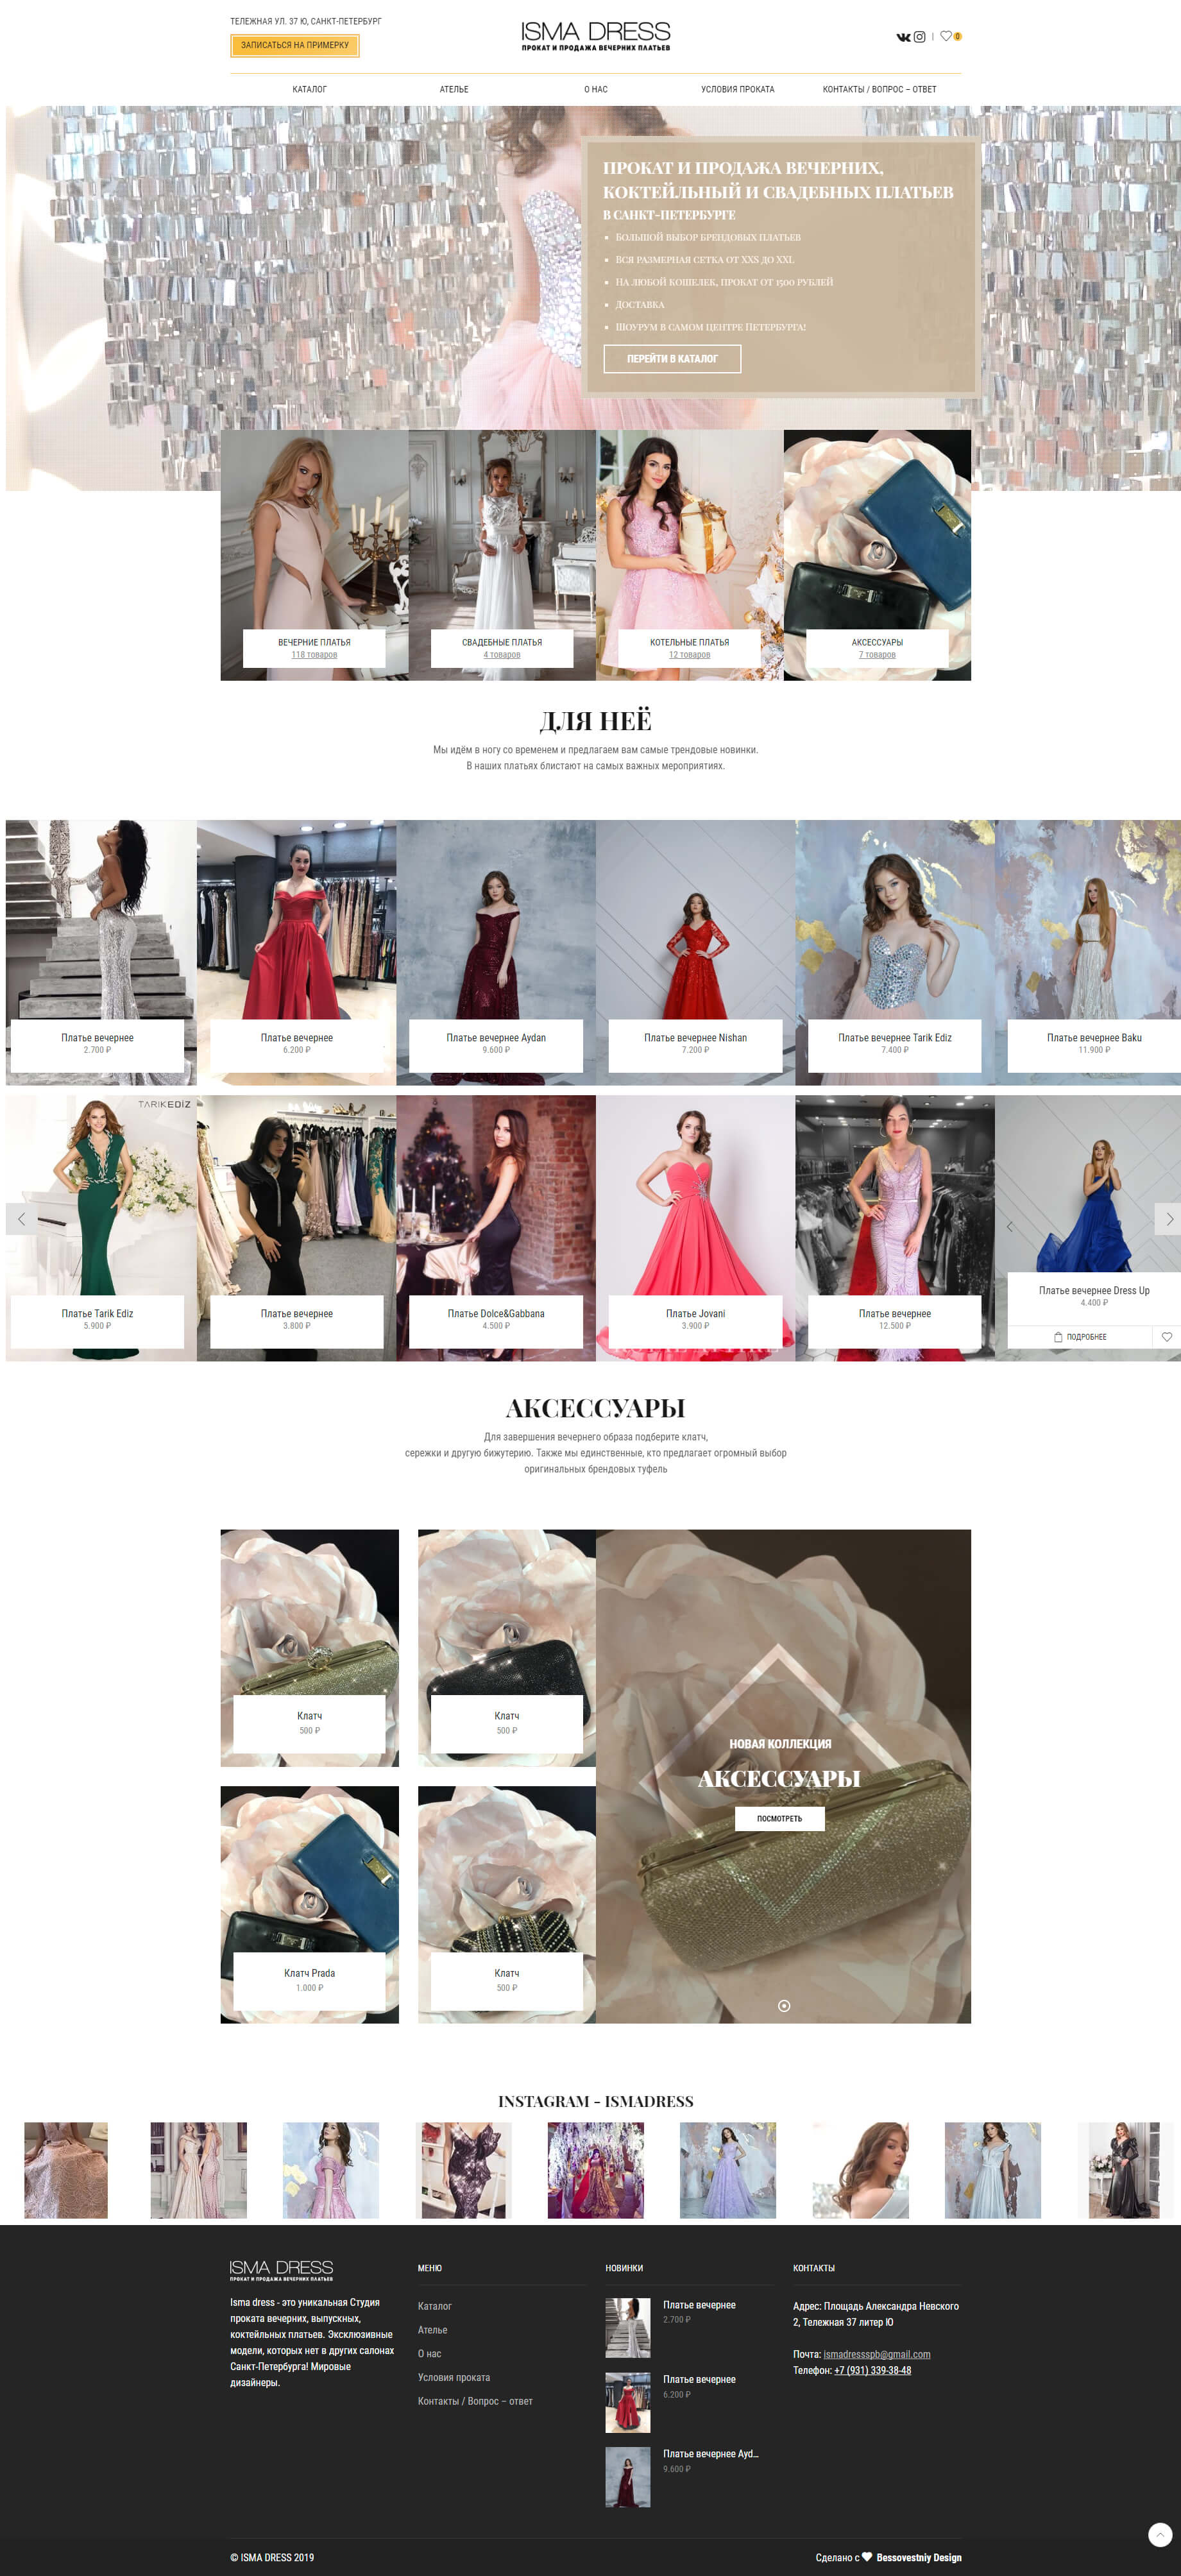 ISMA DRESS